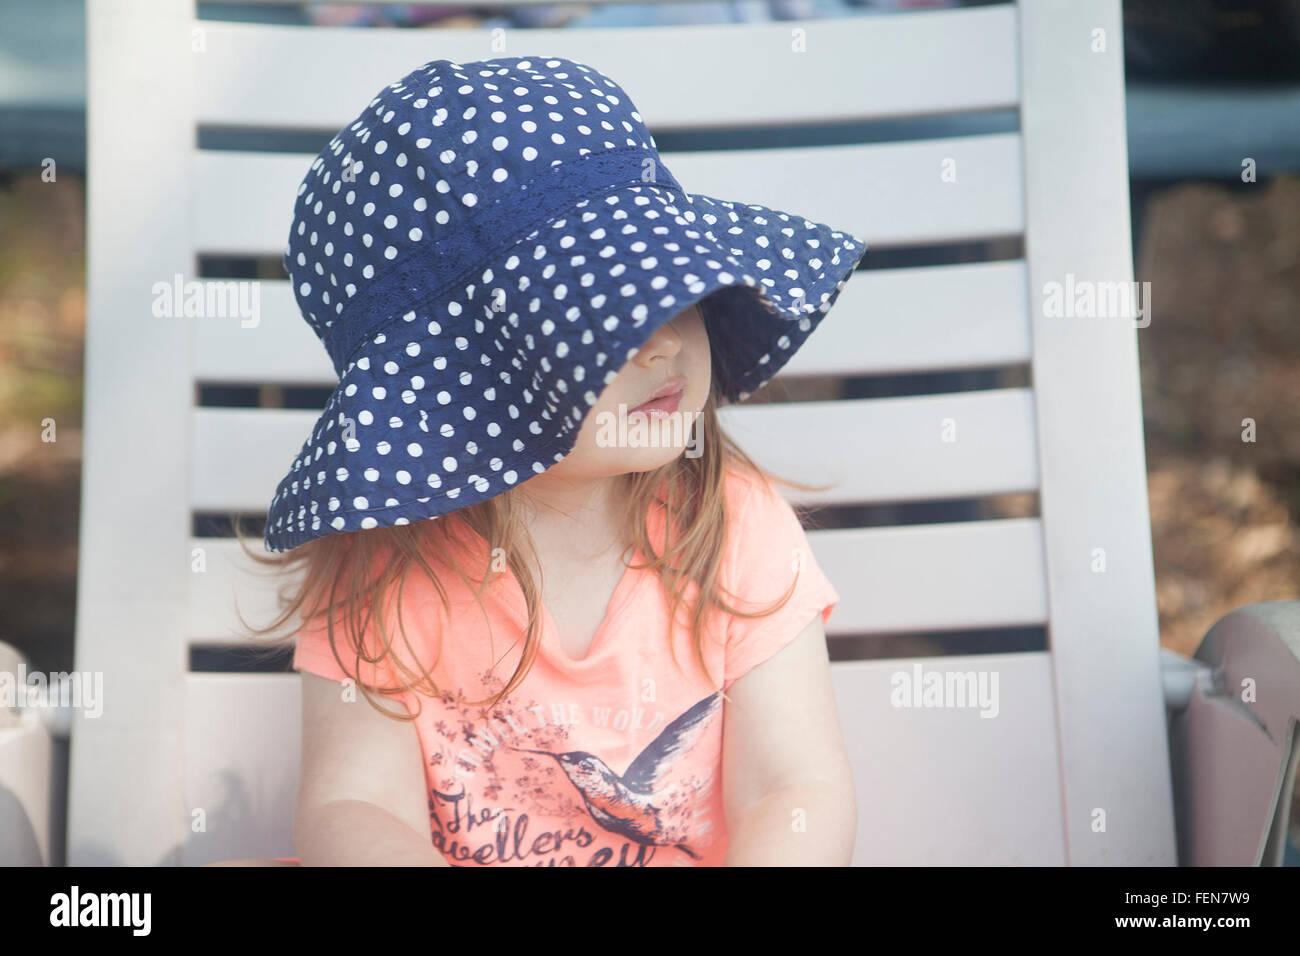 Chica sentada en la tumbona. Imagen De Stock